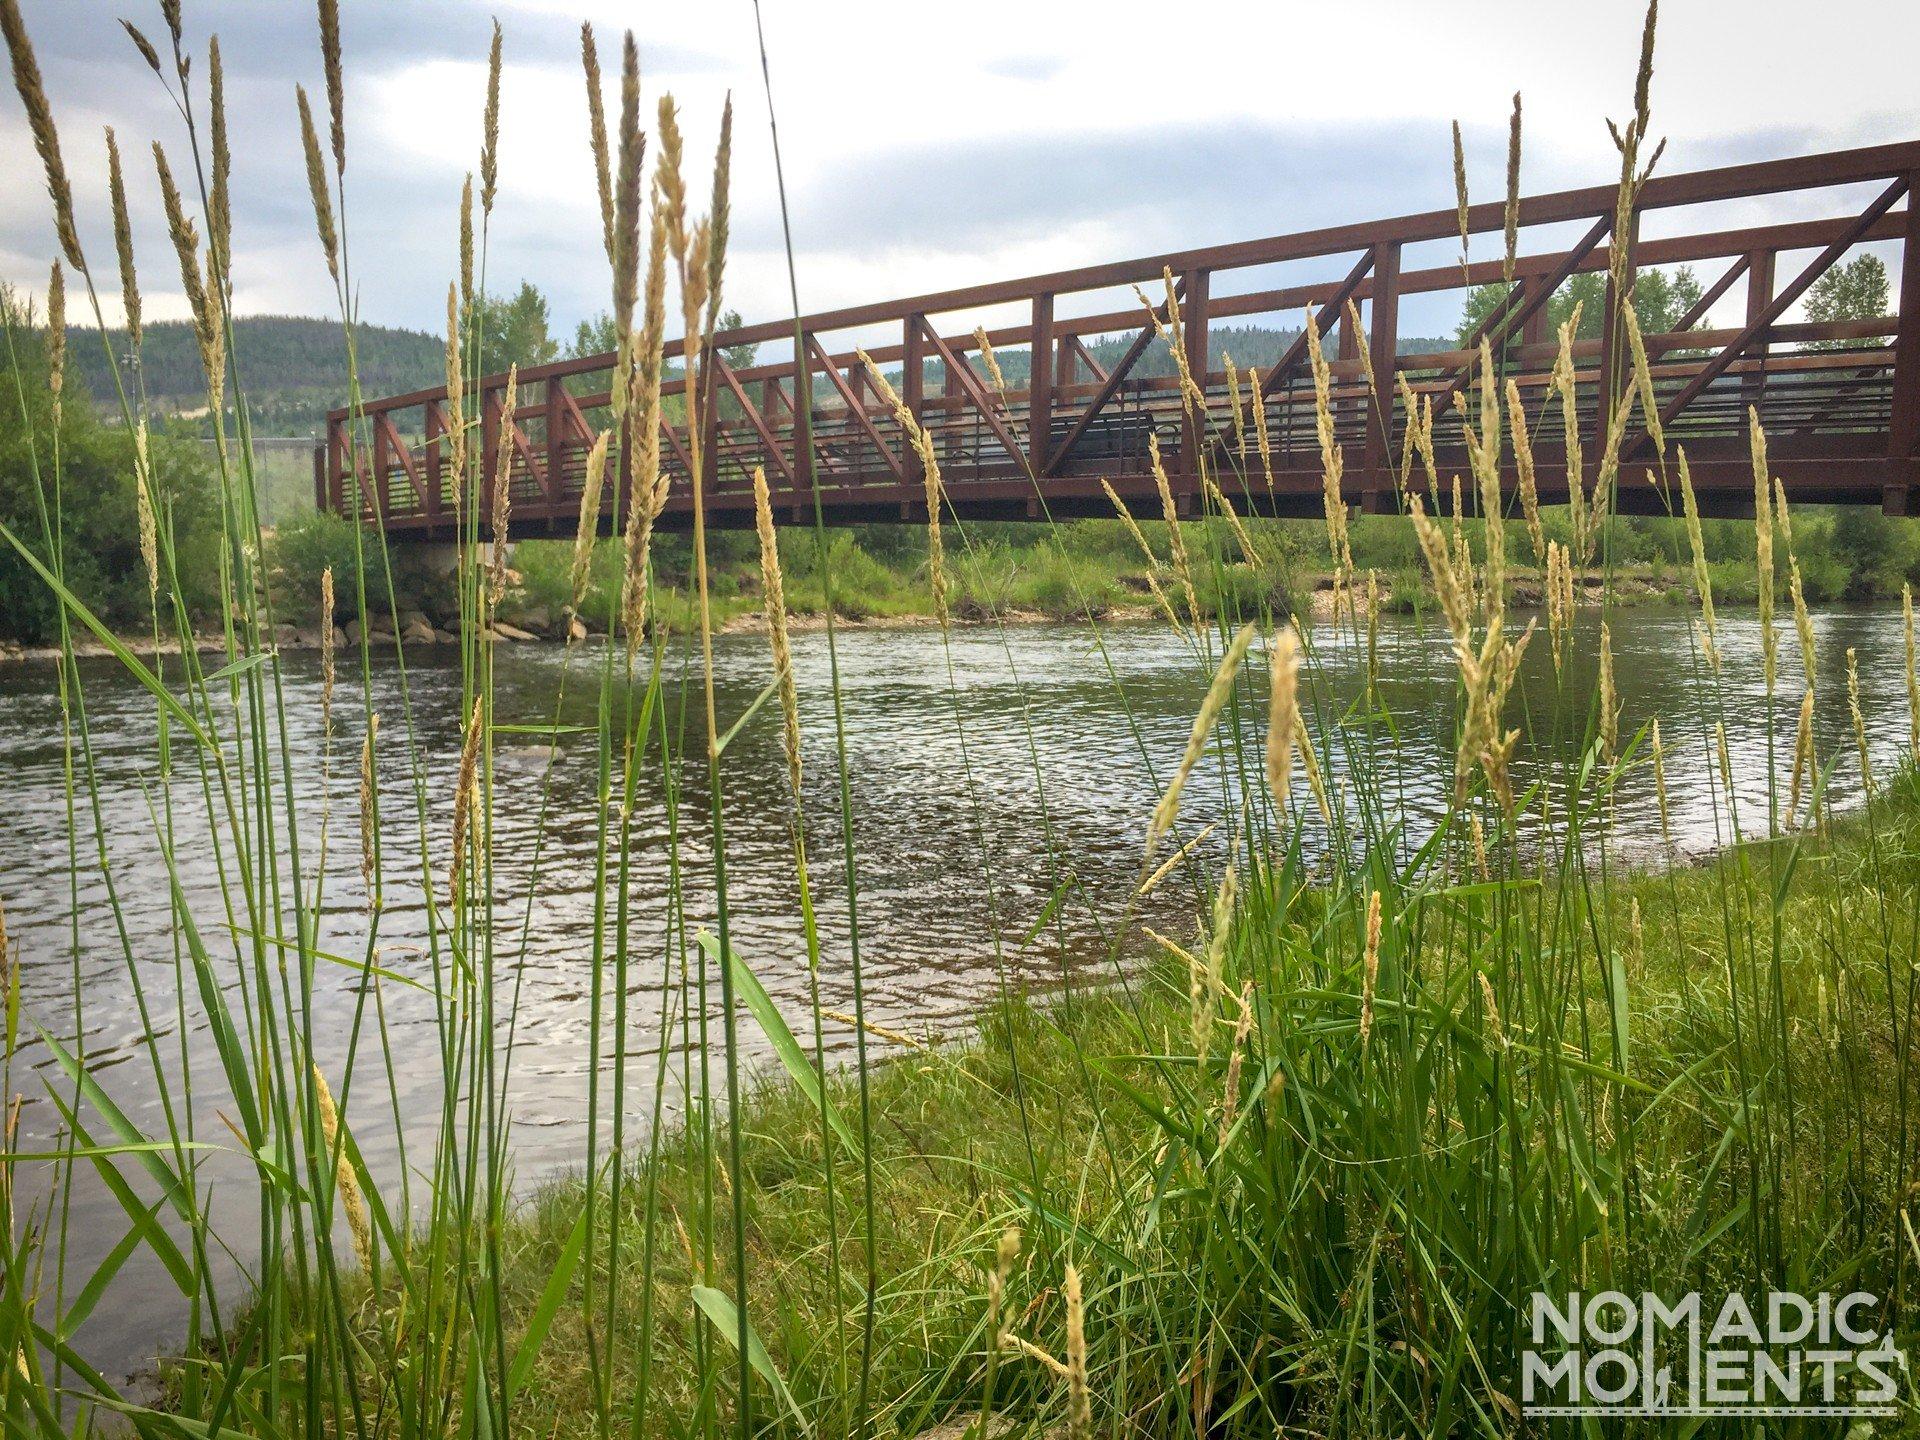 The bridge at Pioneer Park